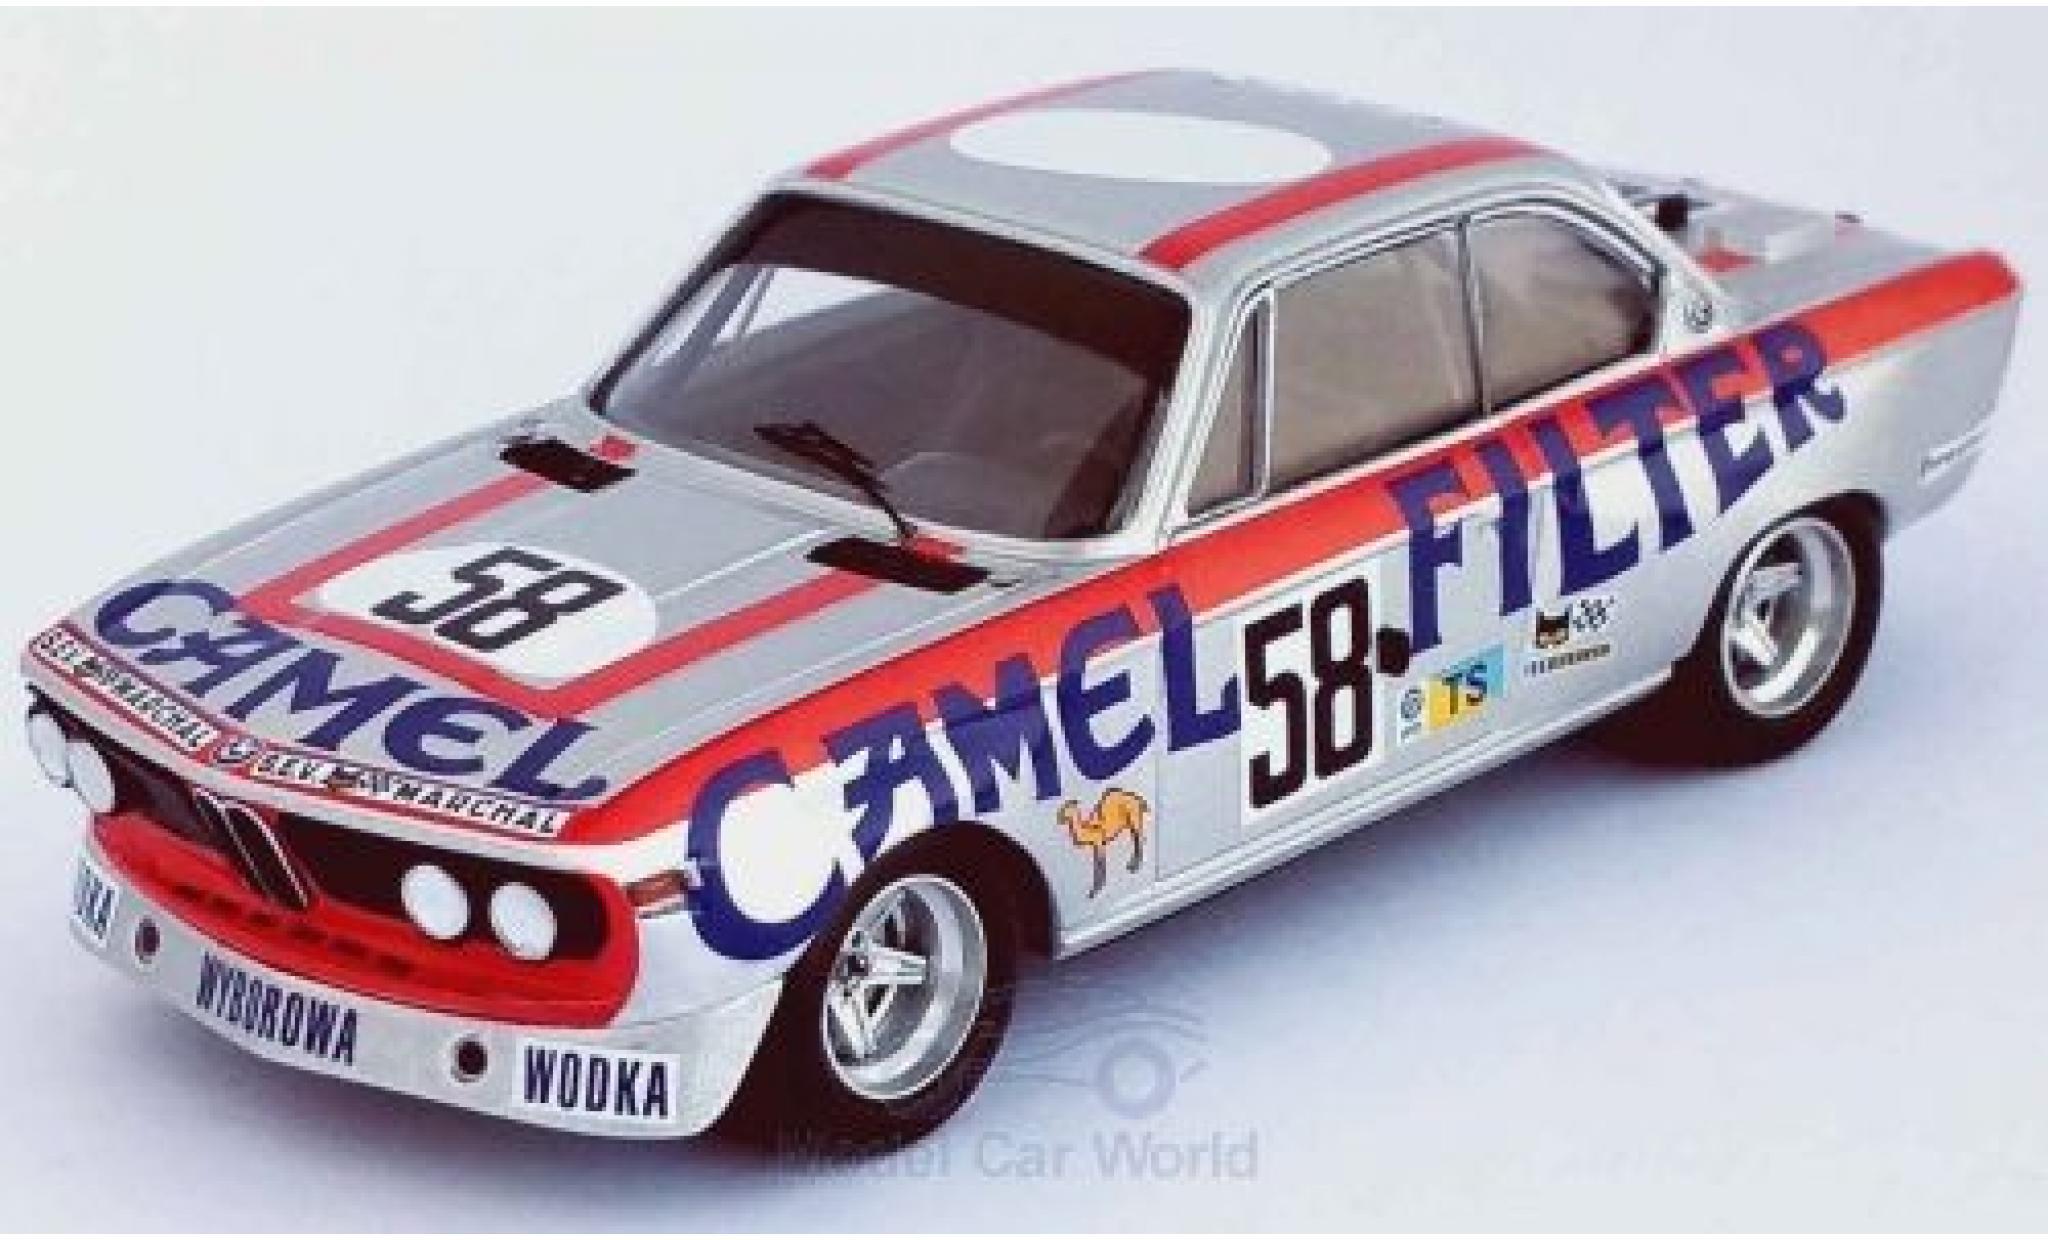 Bmw 3.0 1/43 Trofeu CSL No.58 Camel 24h Le Mans 1973 W.Brun/C.Kocher/J.-P.Aeschlimann